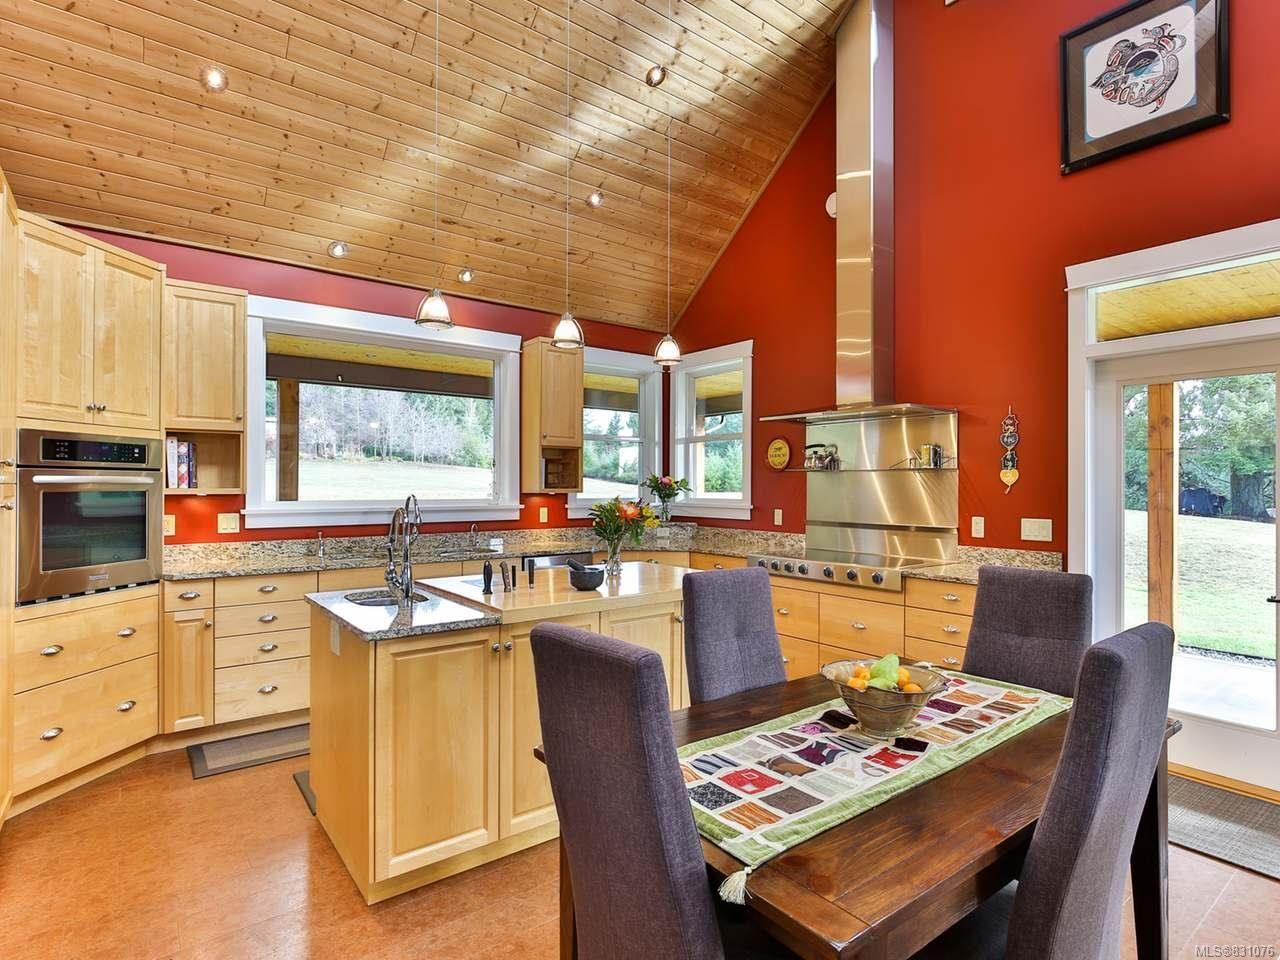 Photo 4: Photos: 6159 Strathcona St in PORT ALBERNI: PA Alberni Valley House for sale (Port Alberni)  : MLS®# 831076